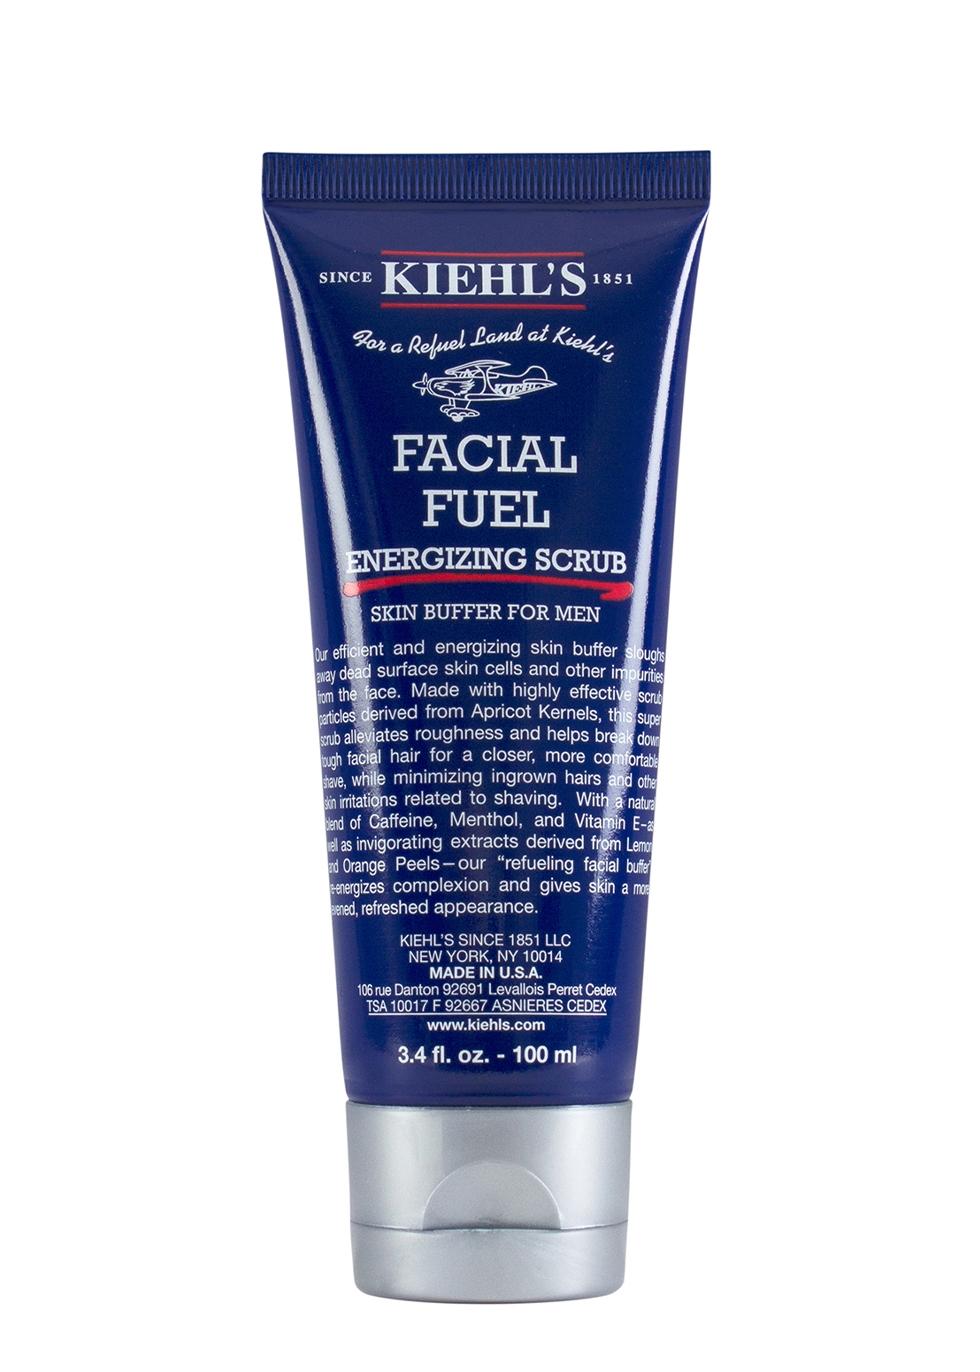 Facial Fuel Energizing Scrub 100ml